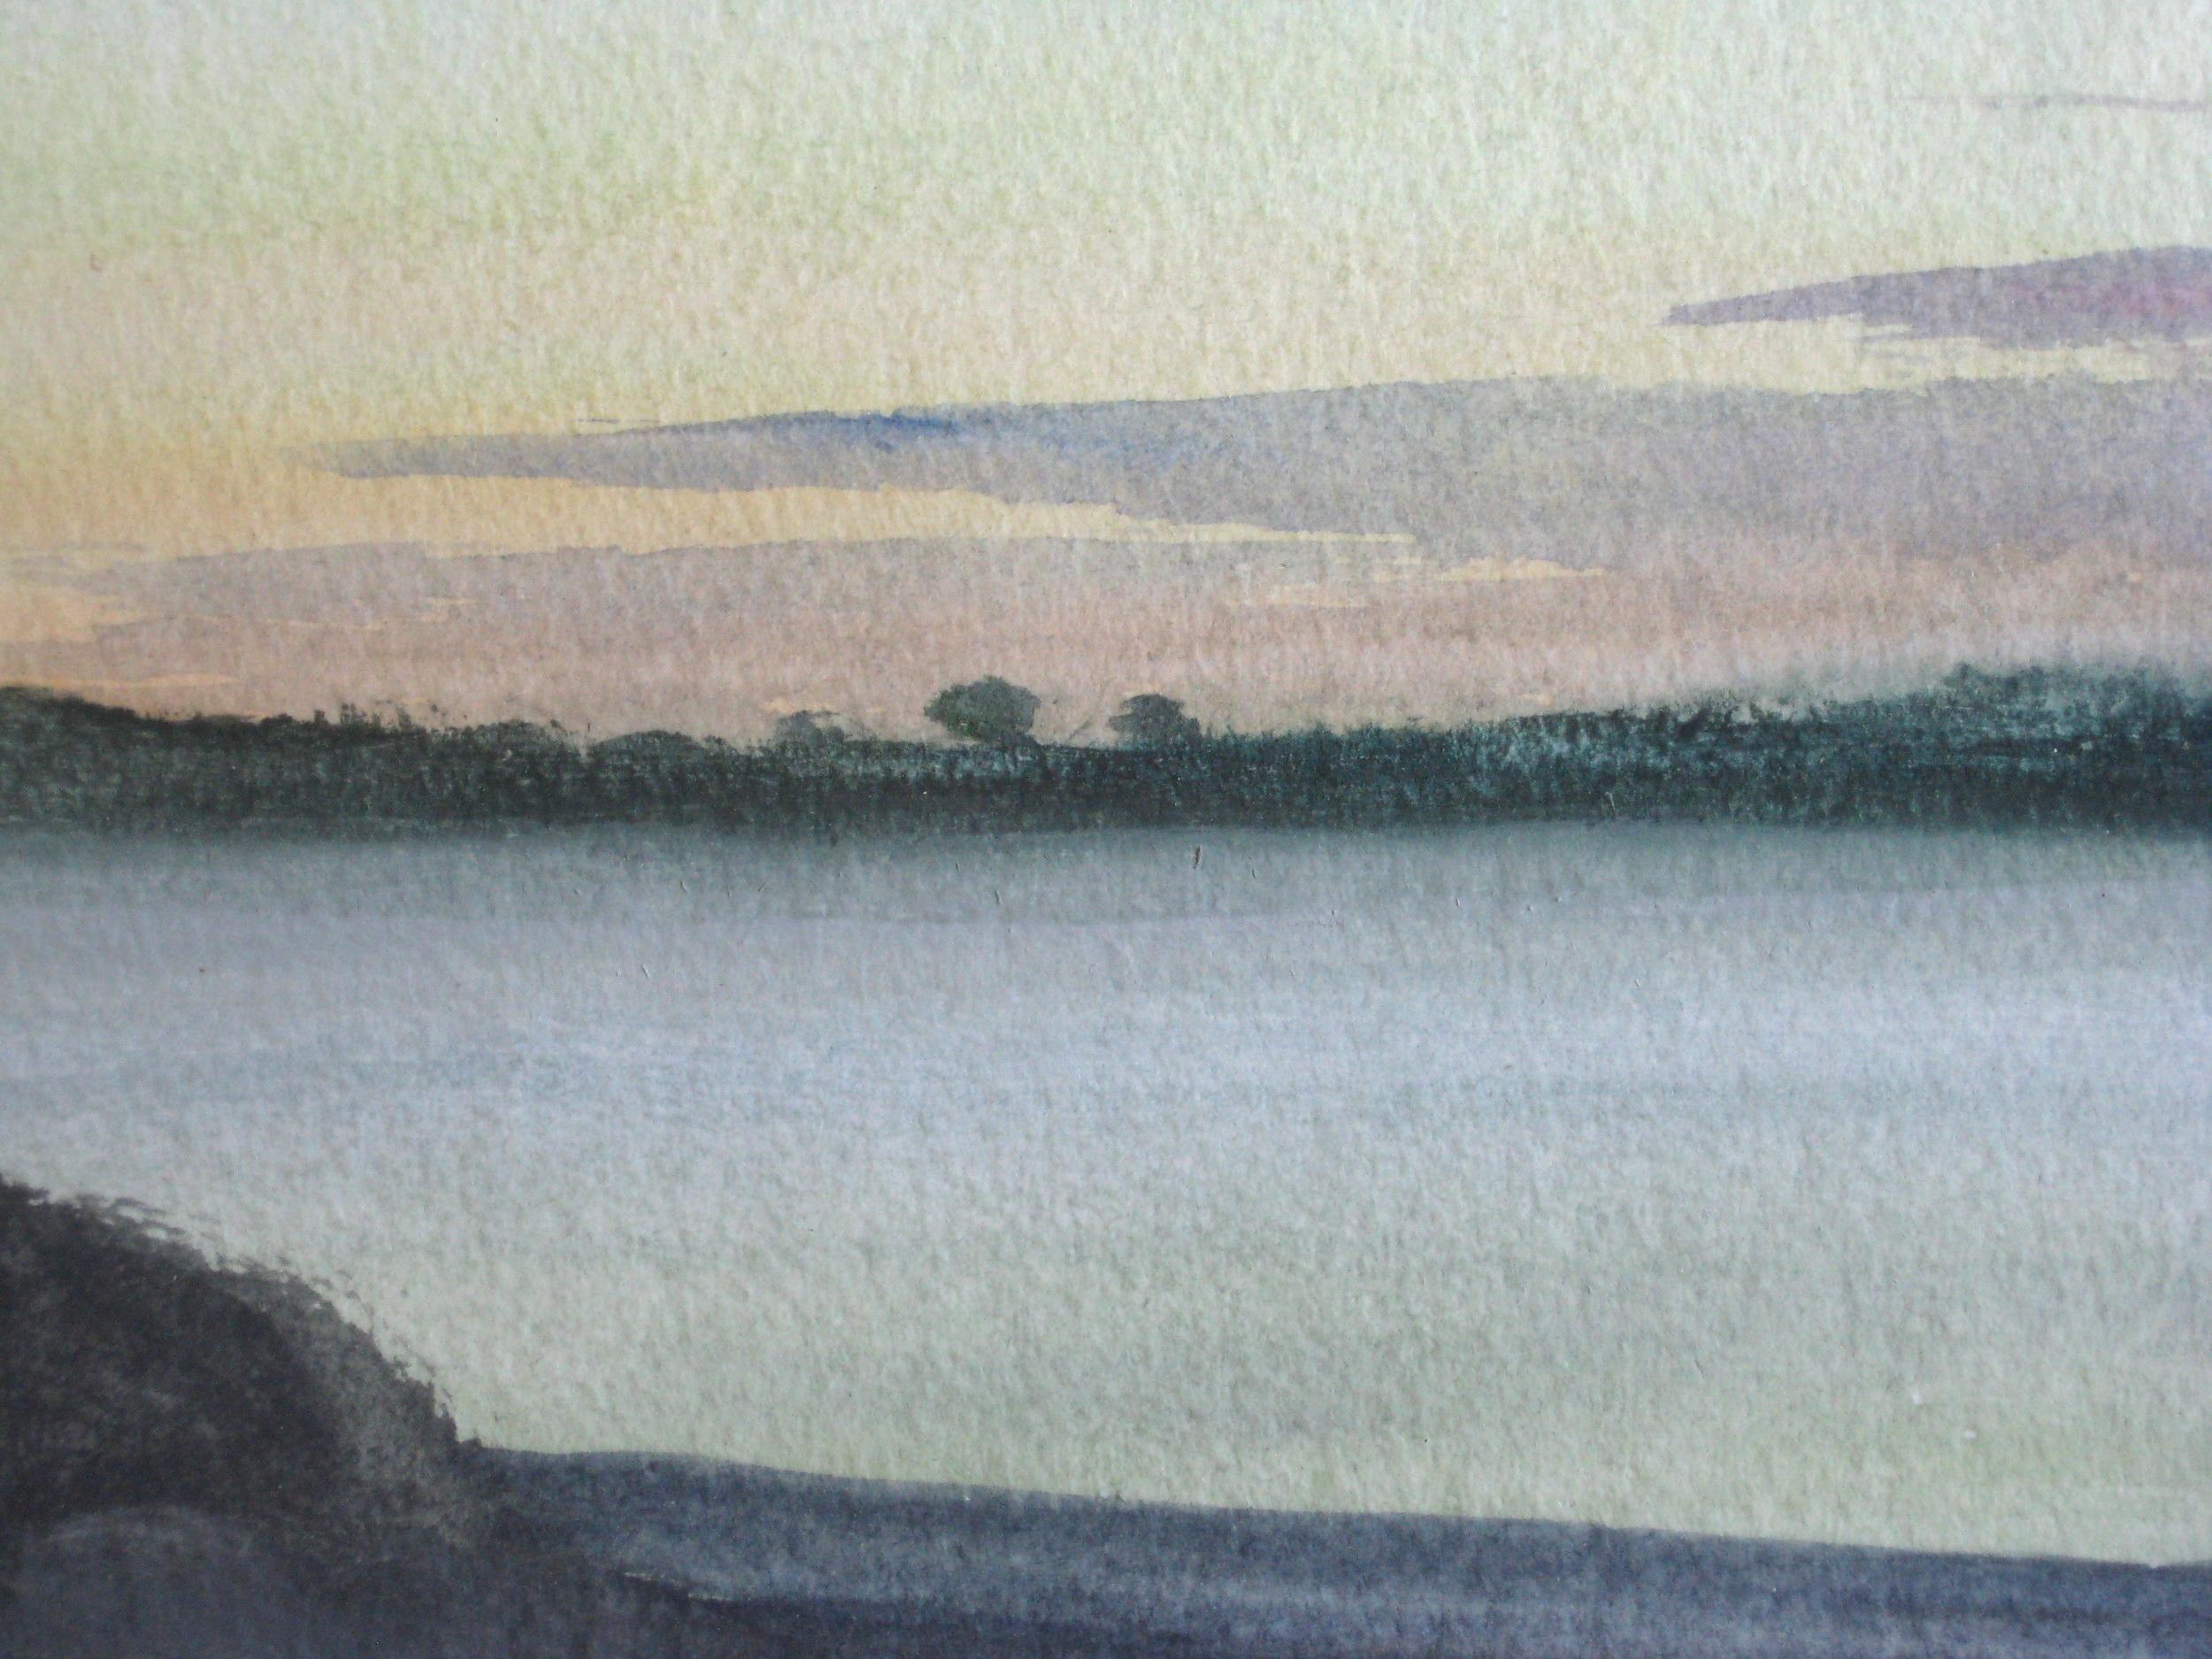 "SANDY COVE  6.5X5.75"" (17X14cm) Watercolour"